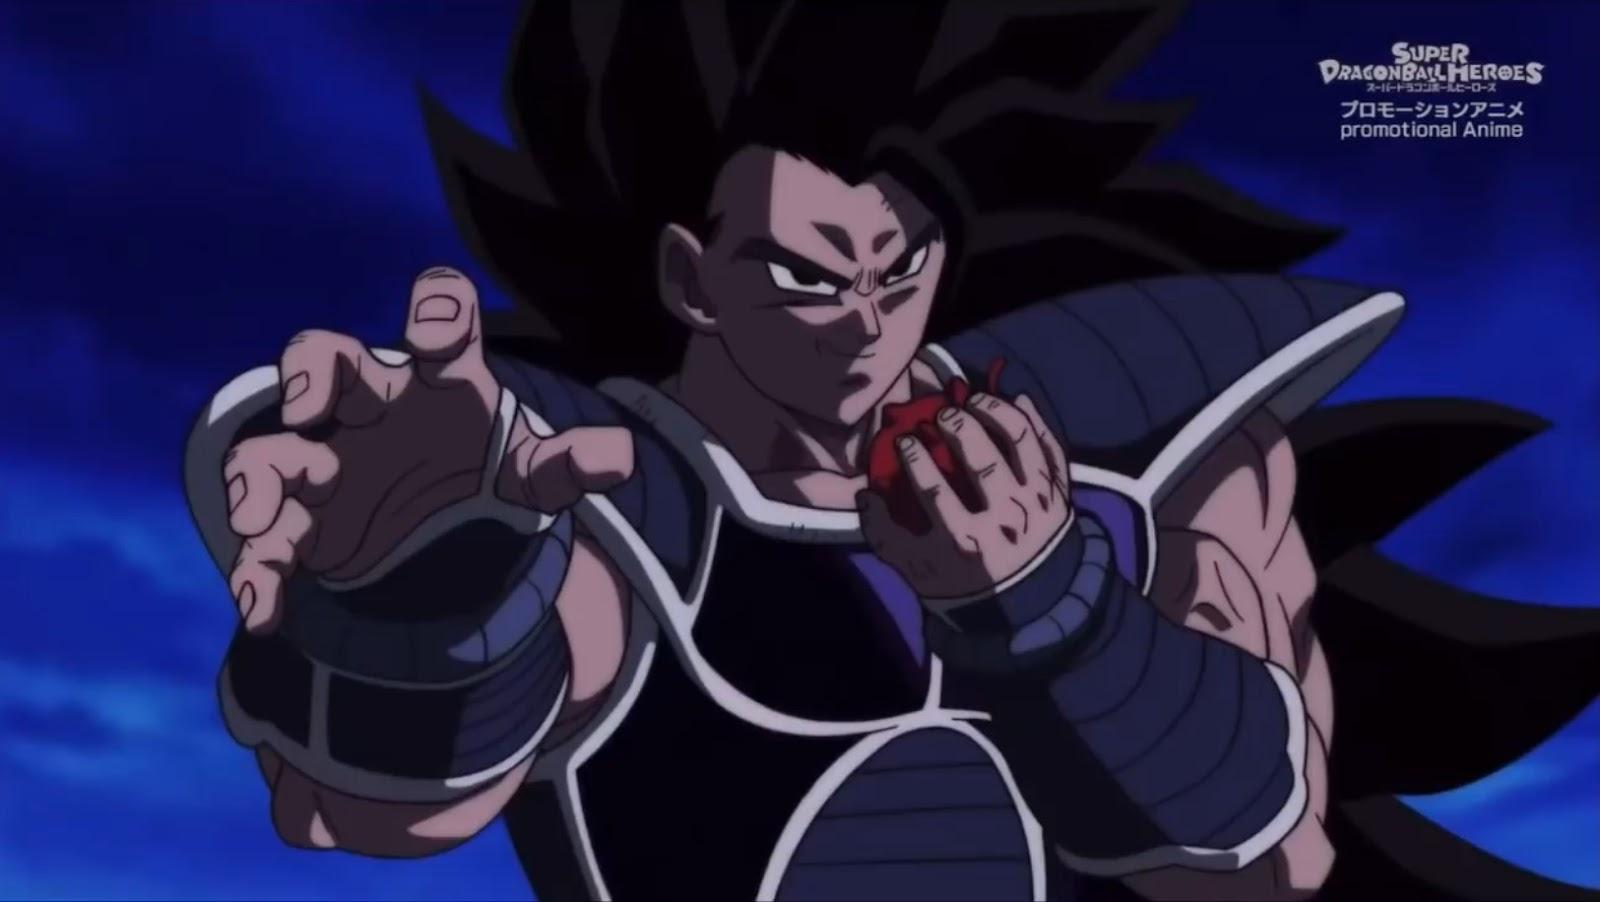 Turles - Super Dragon Ball Heroes Big Bang Mission 8